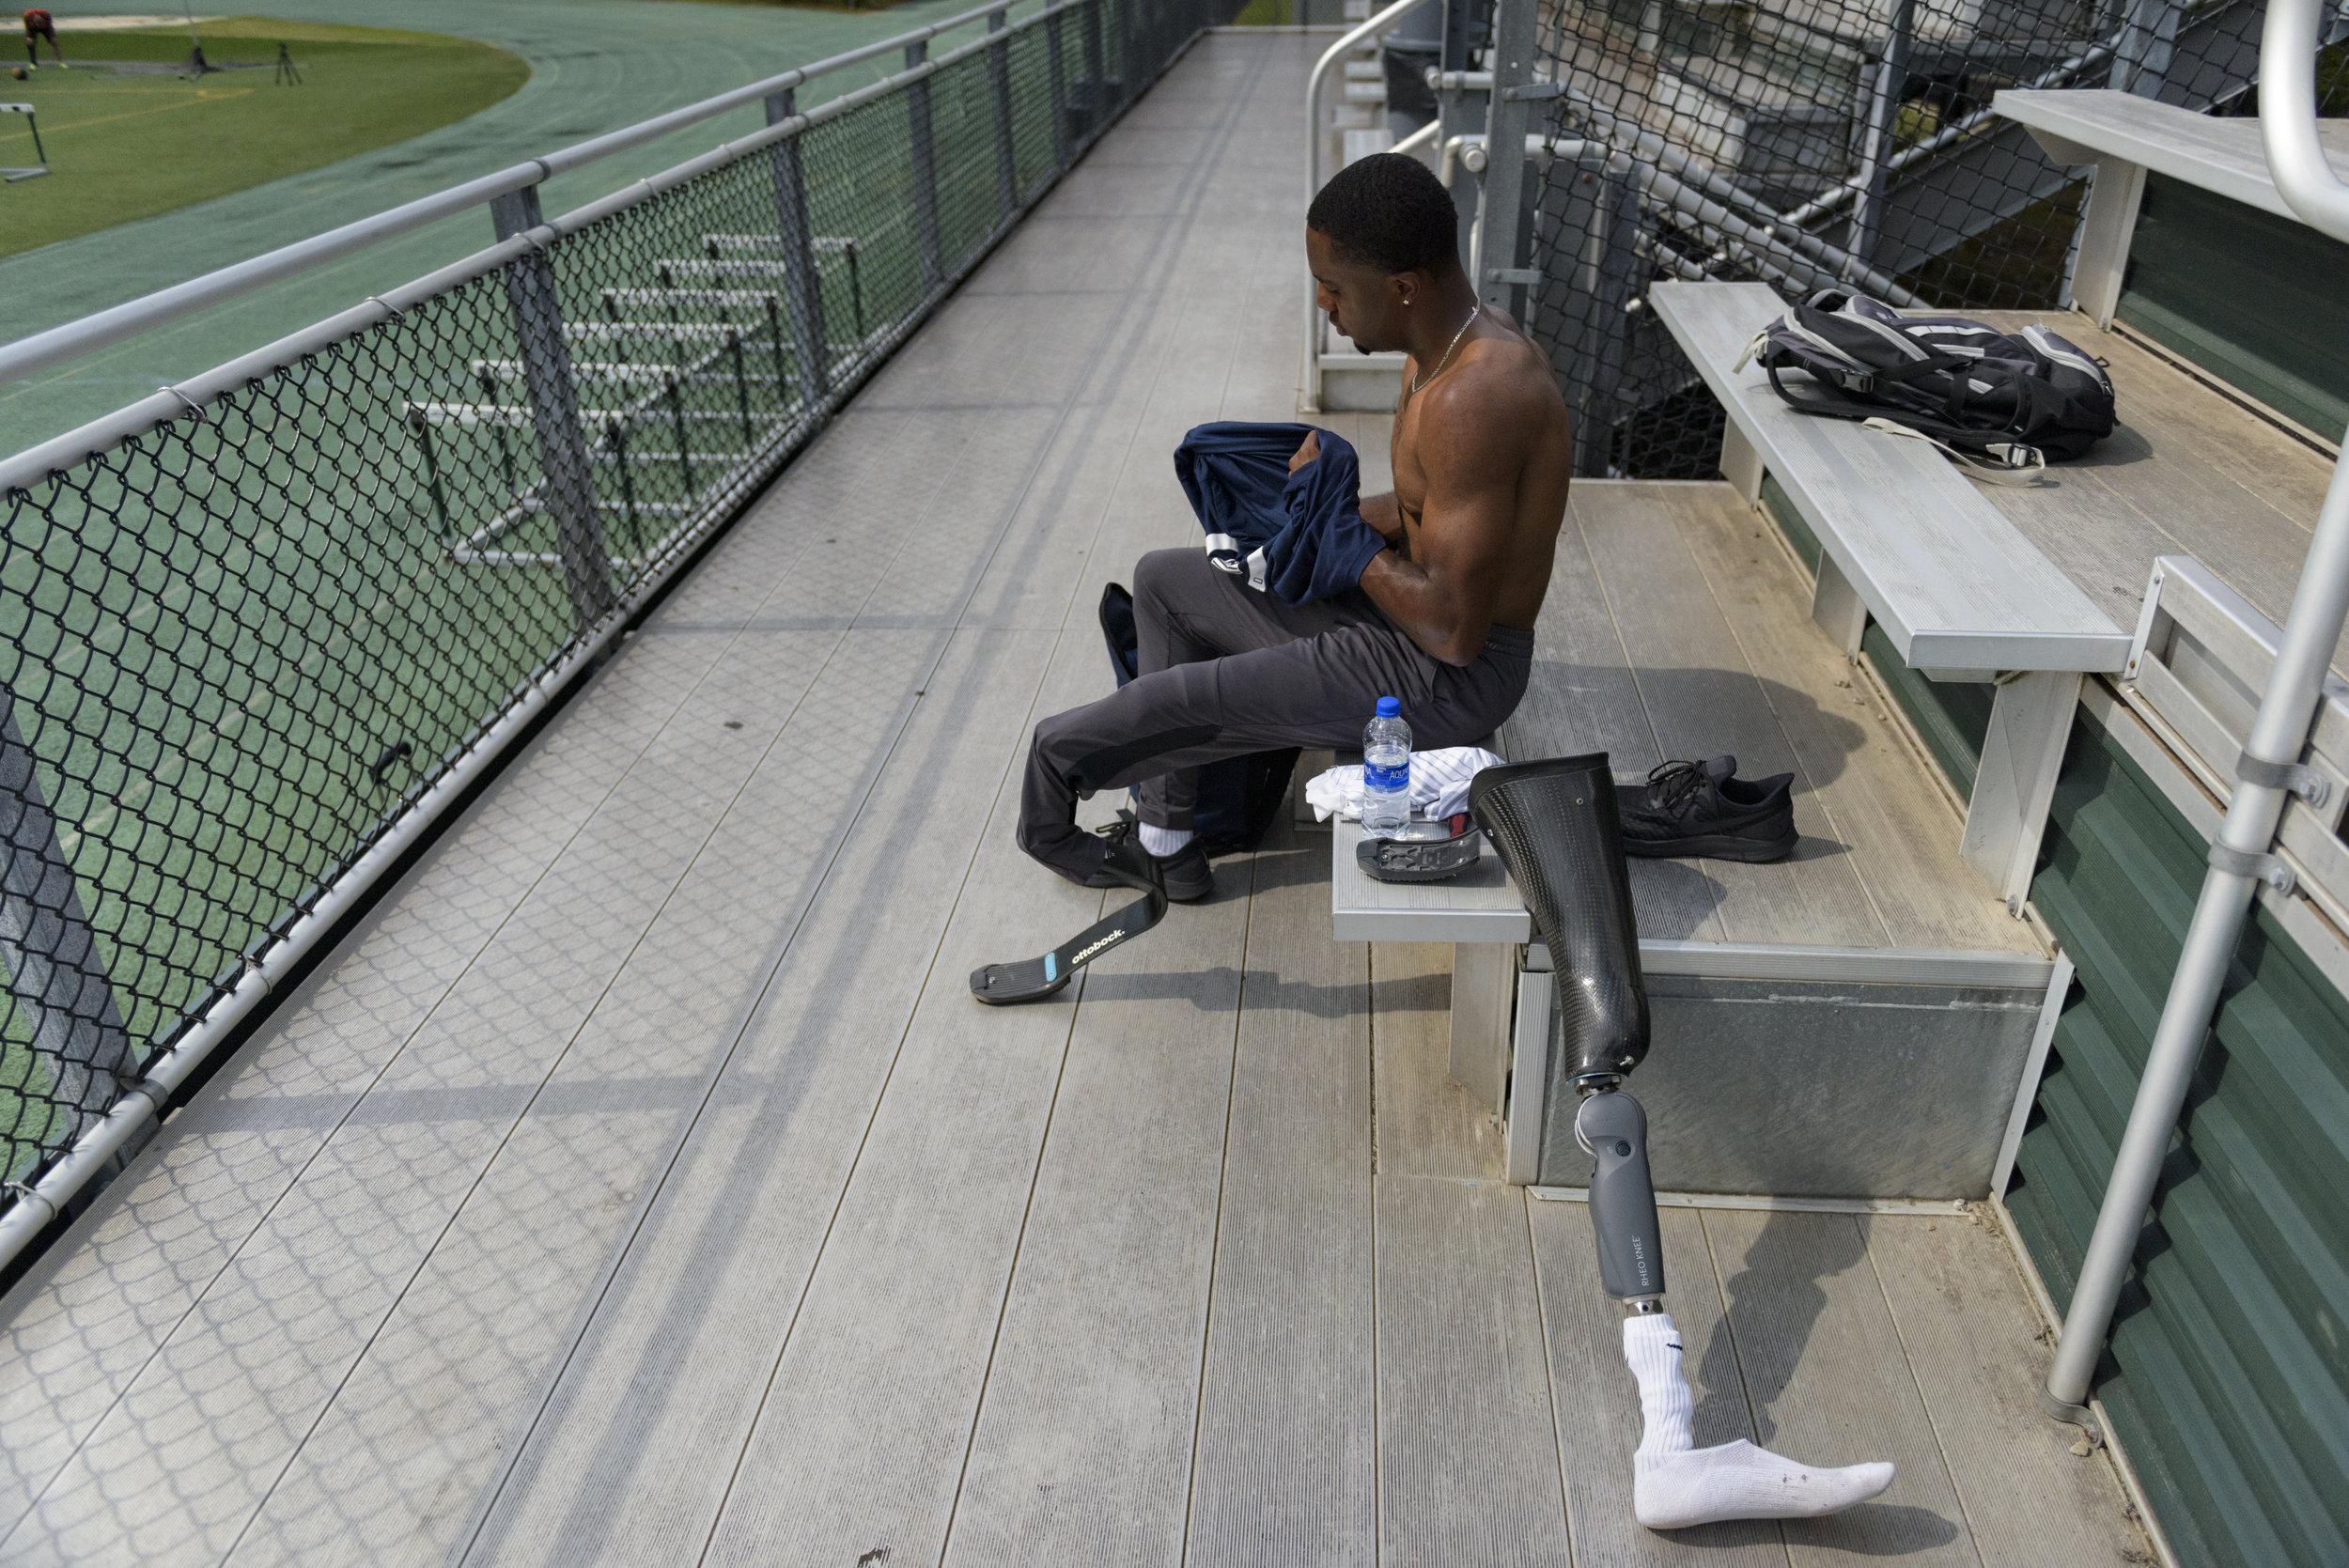 U.S. Paralympian Desmond Jackson prepares for practice on June 6, 2019 in Raleigh, NC.